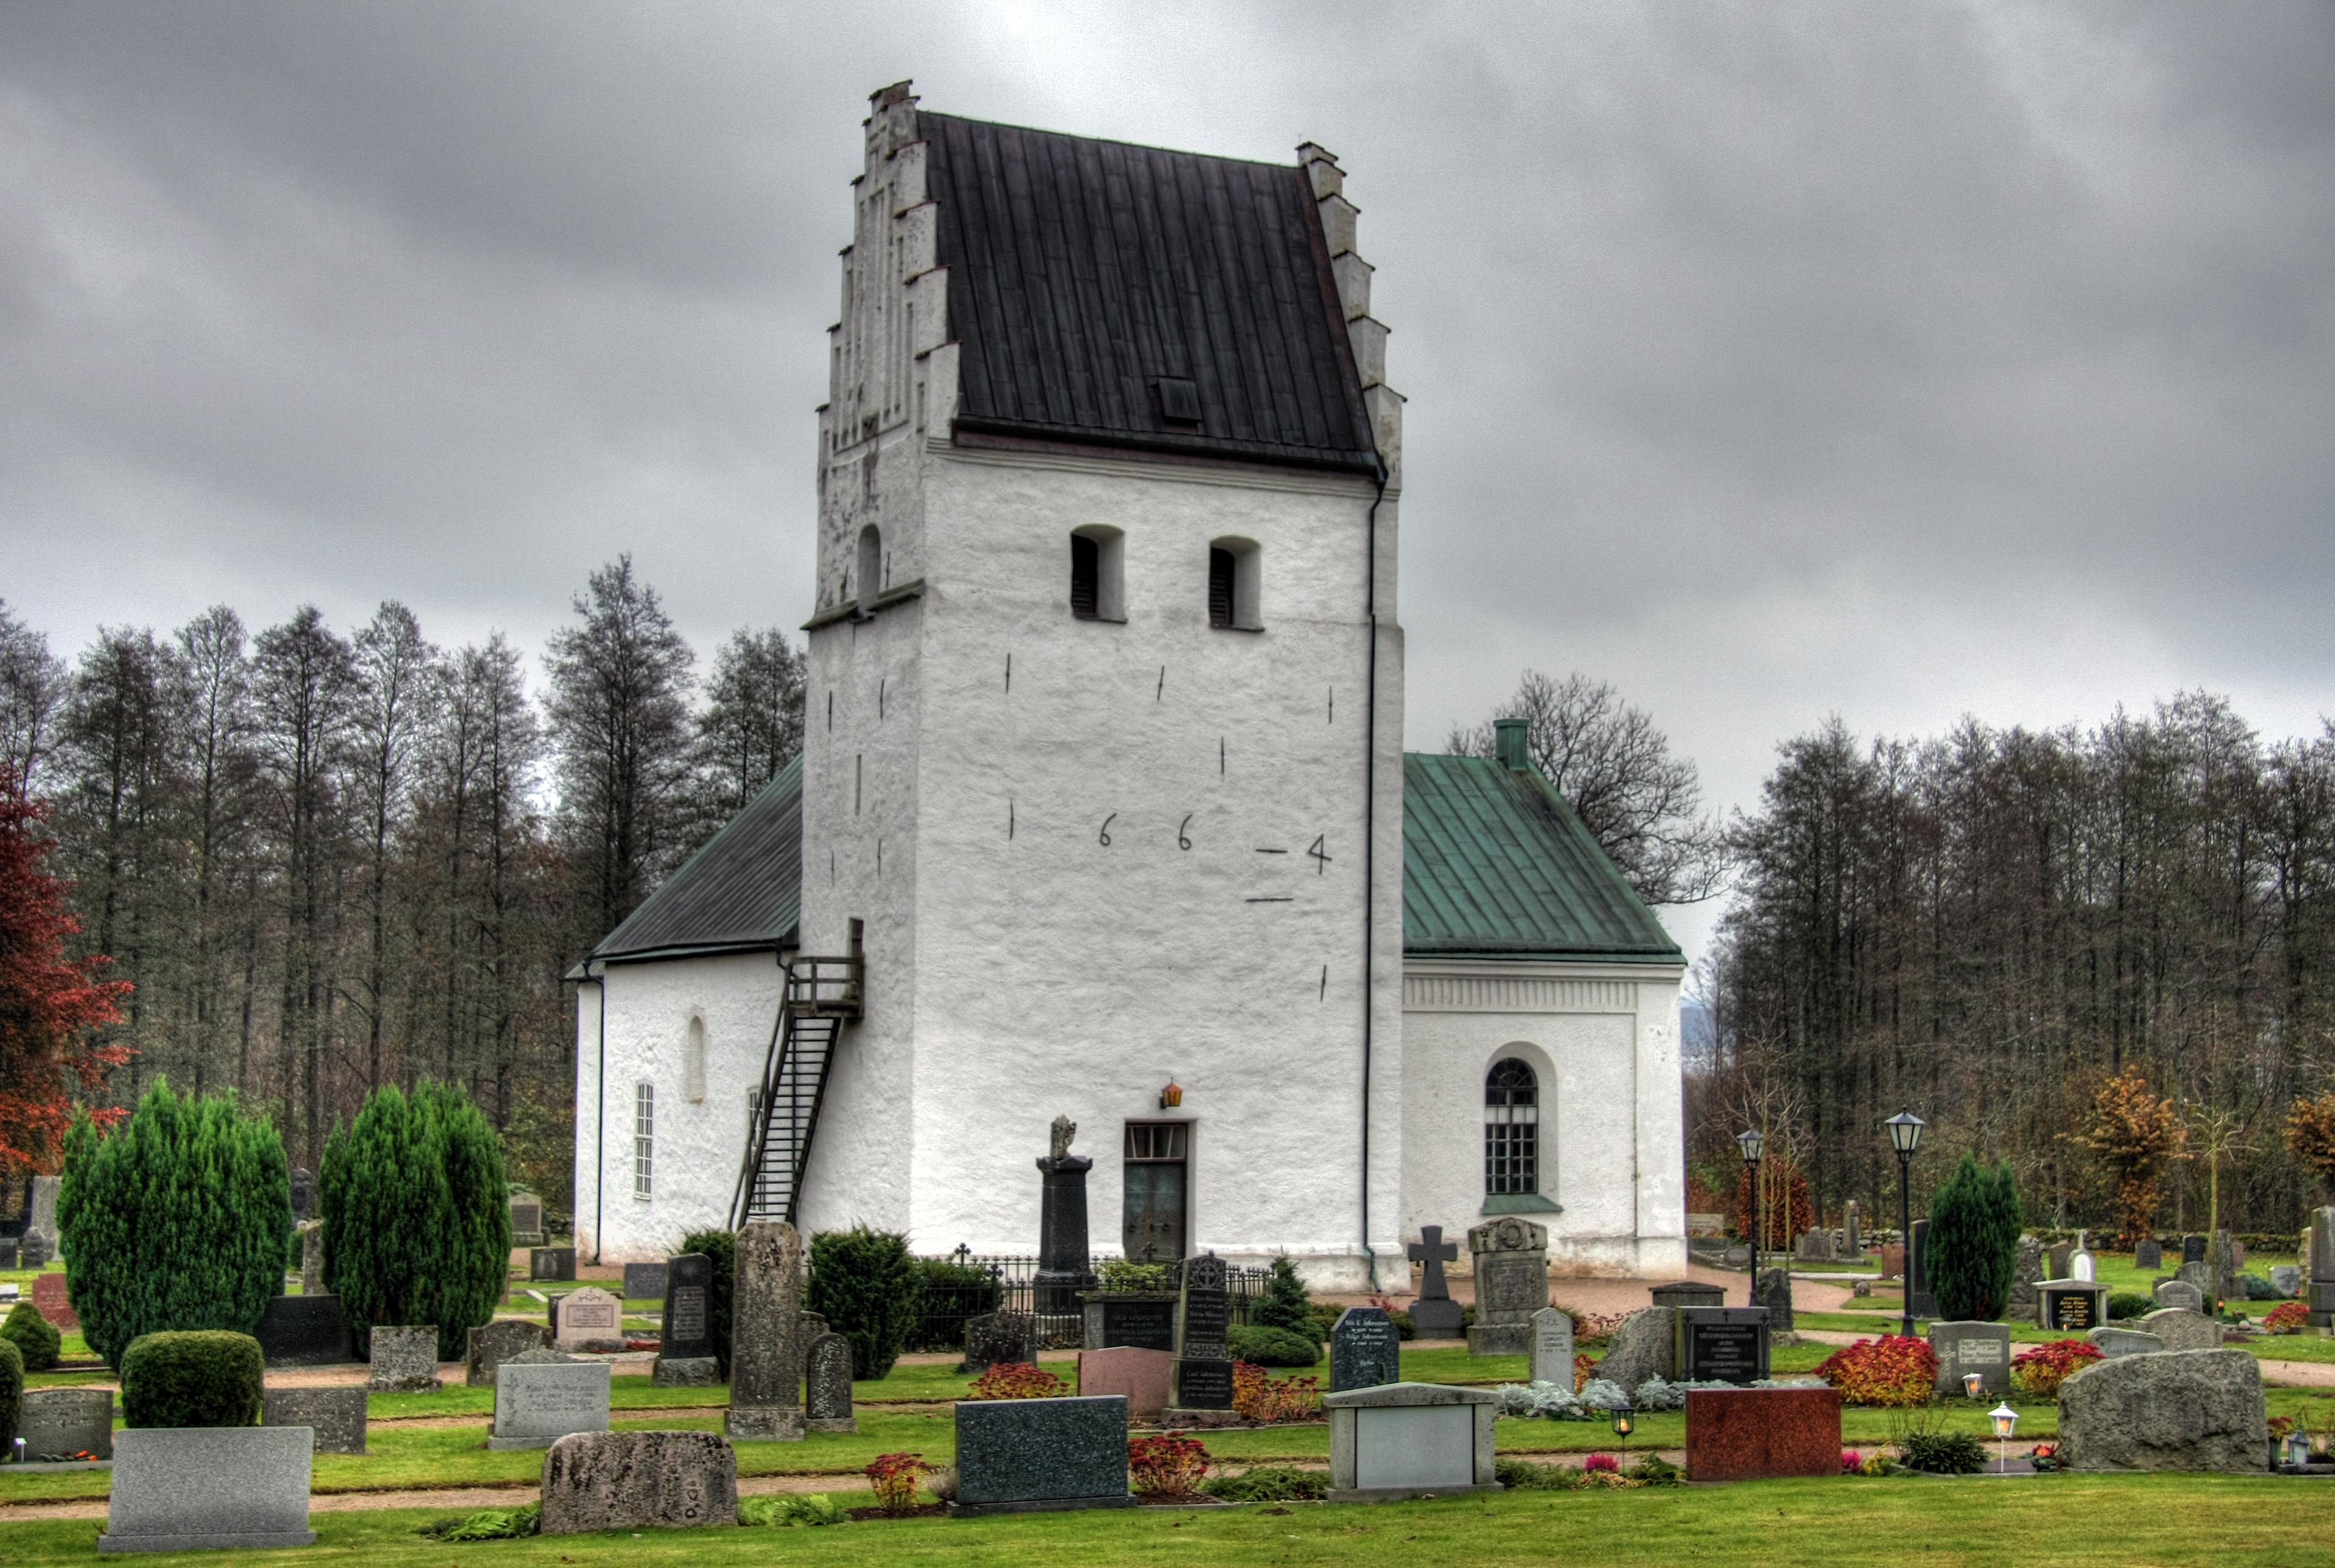 singelbörse finja Kamp-Lintfort